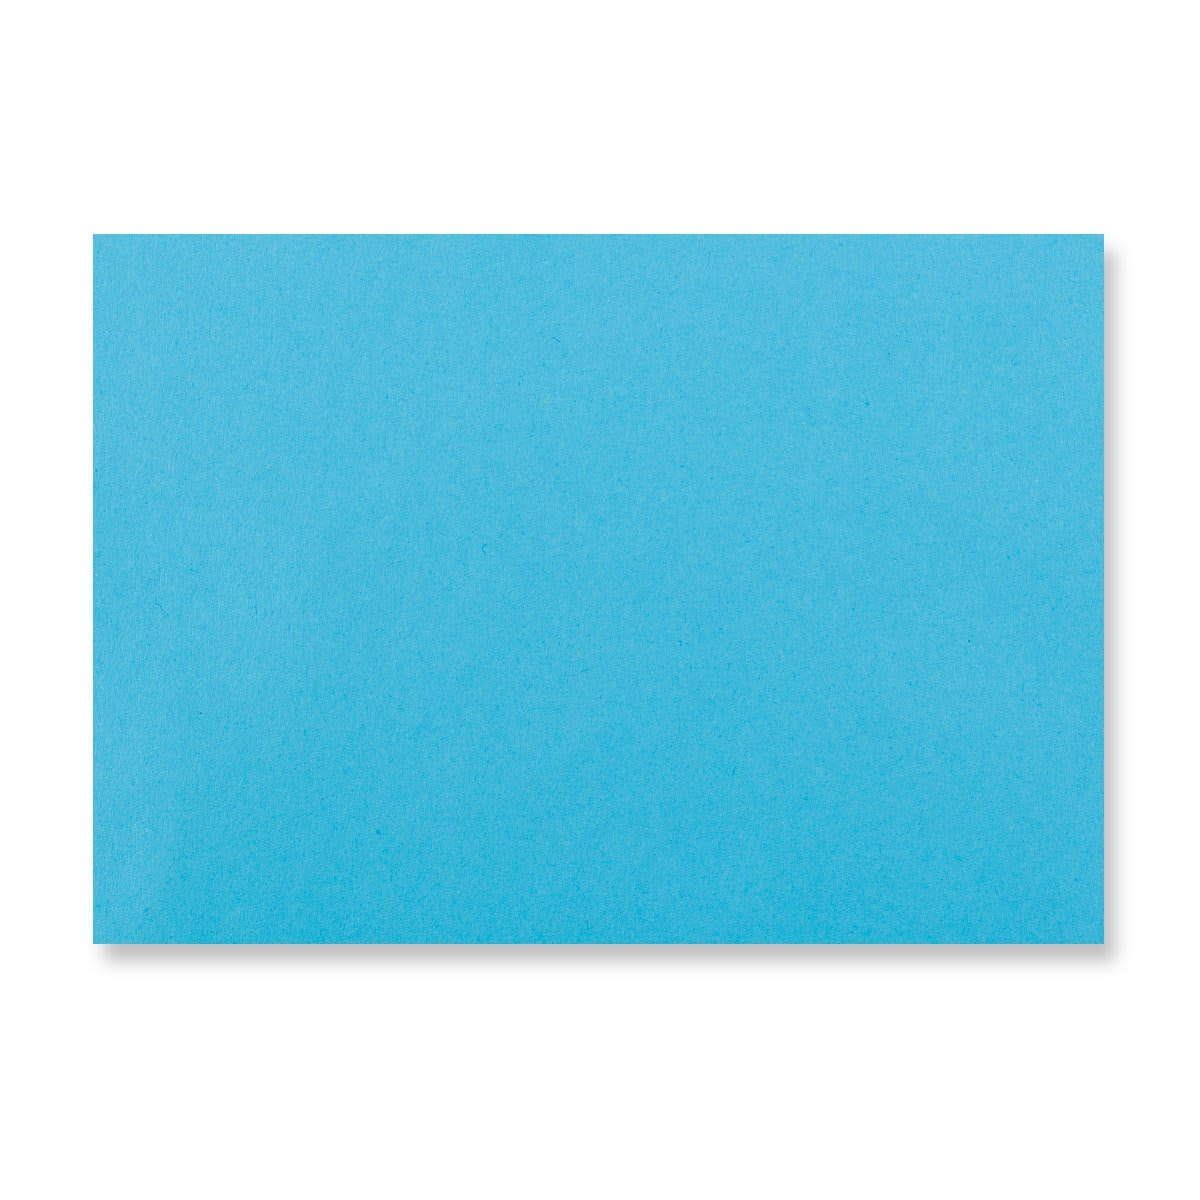 C6 BLUE V-FLAP PEEL AND SEAL ENVELOPES